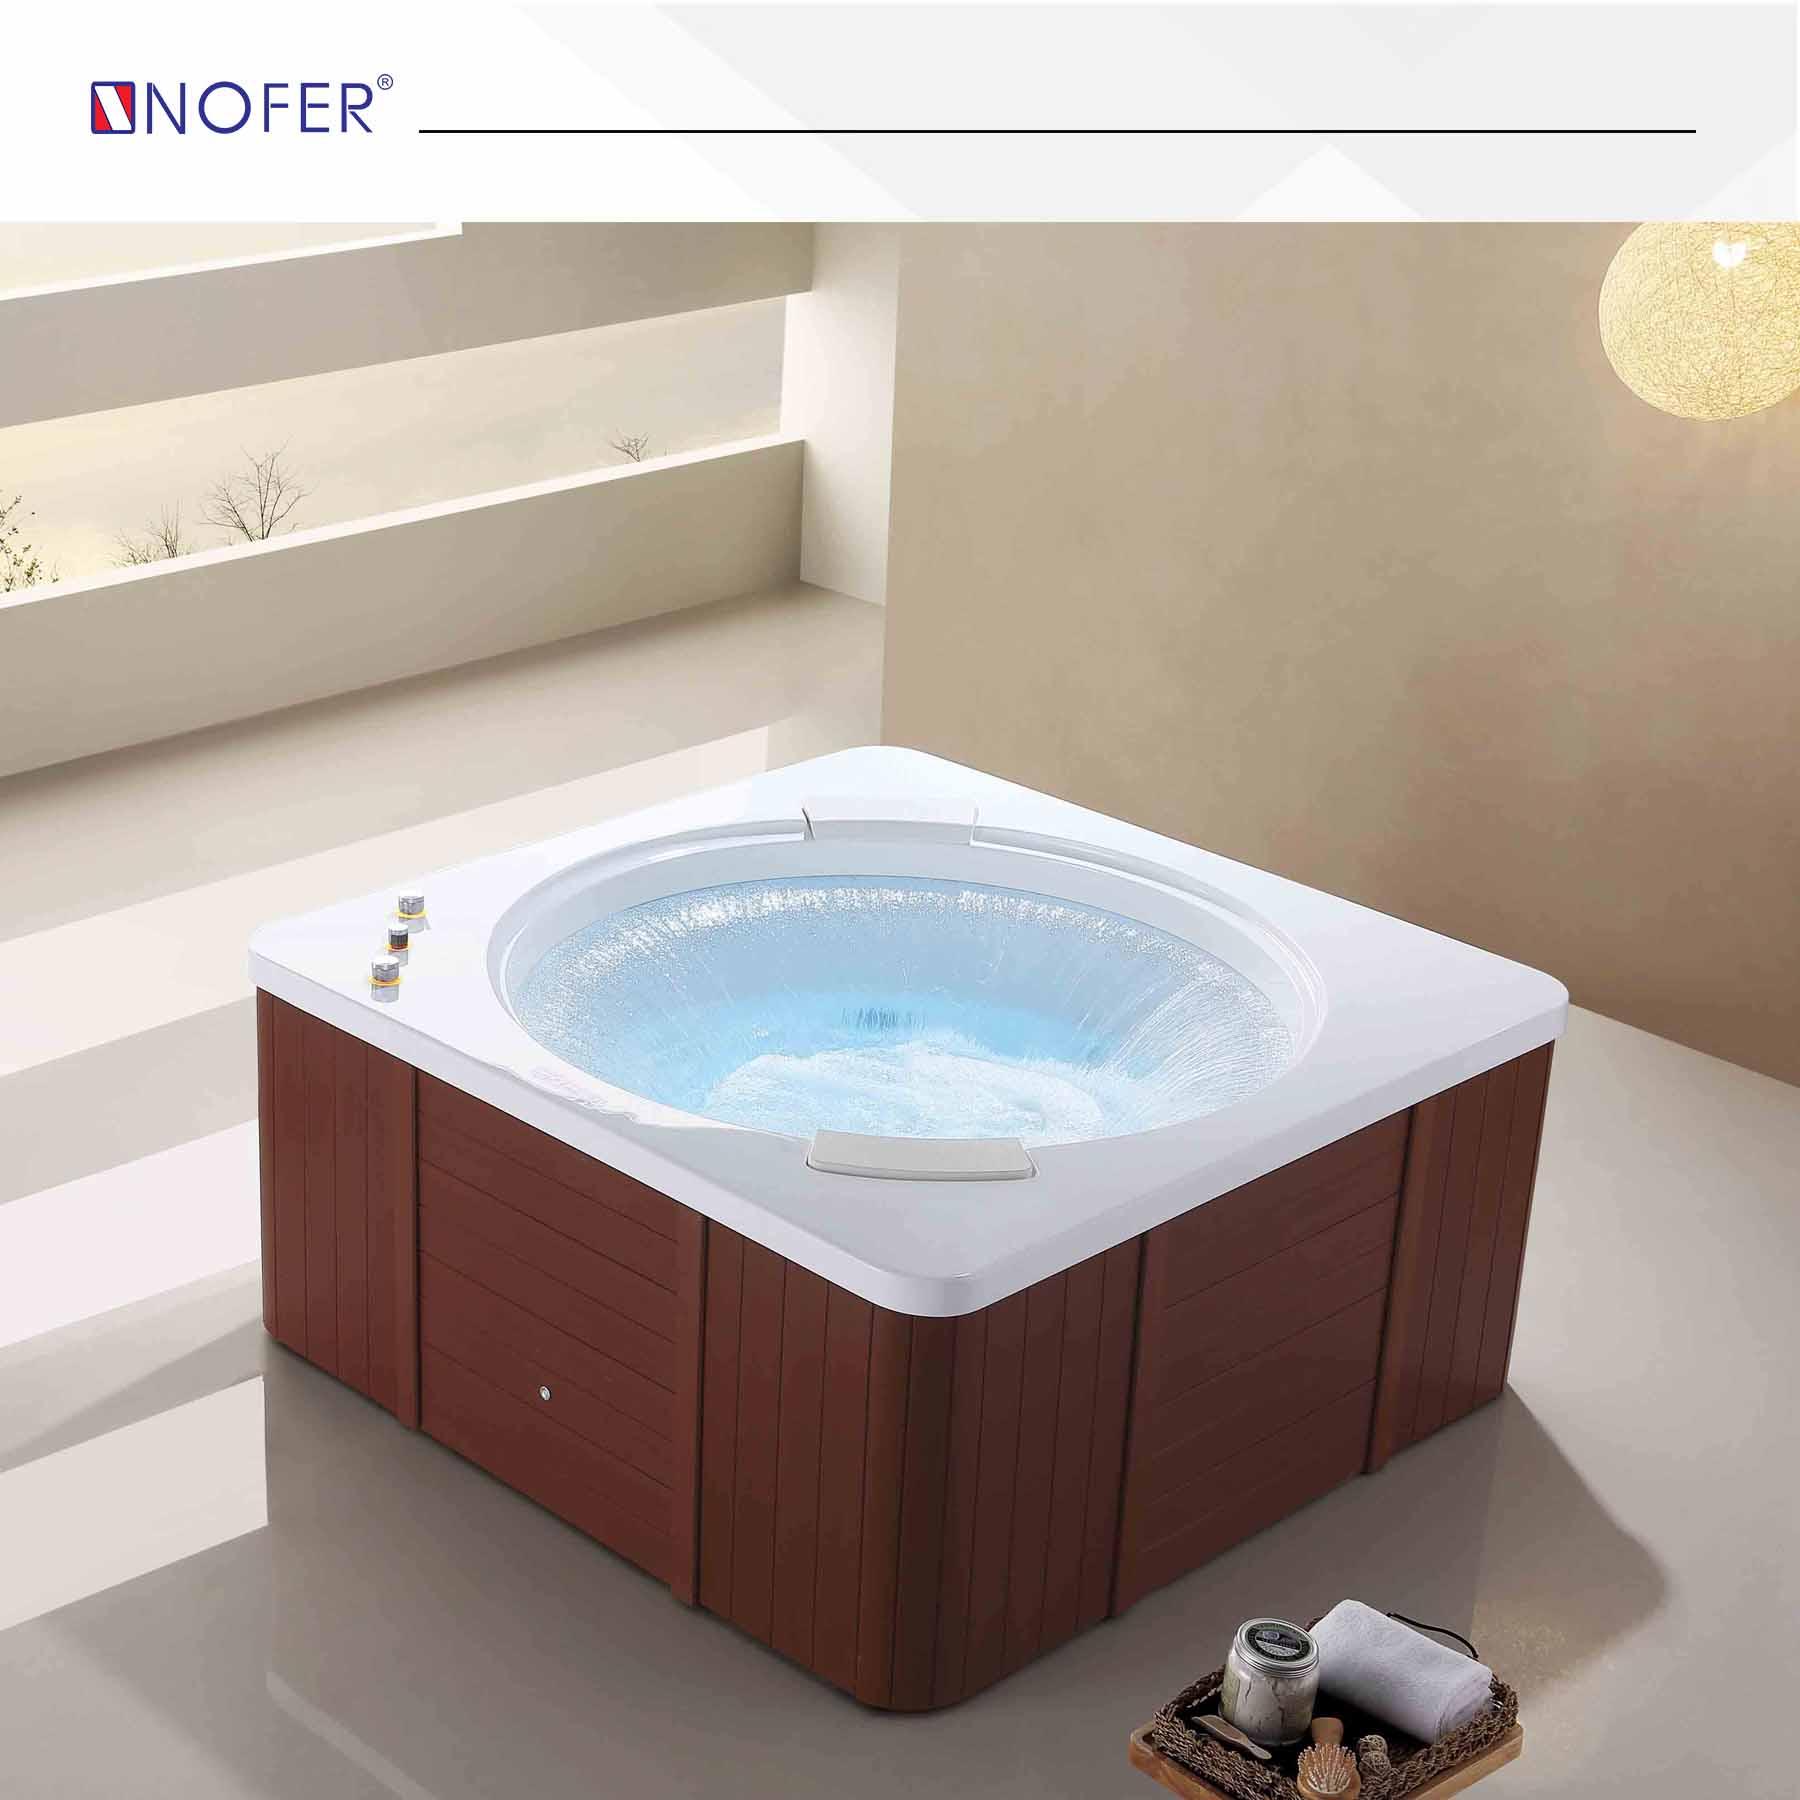 Bồn tắm massage NG-7400DG